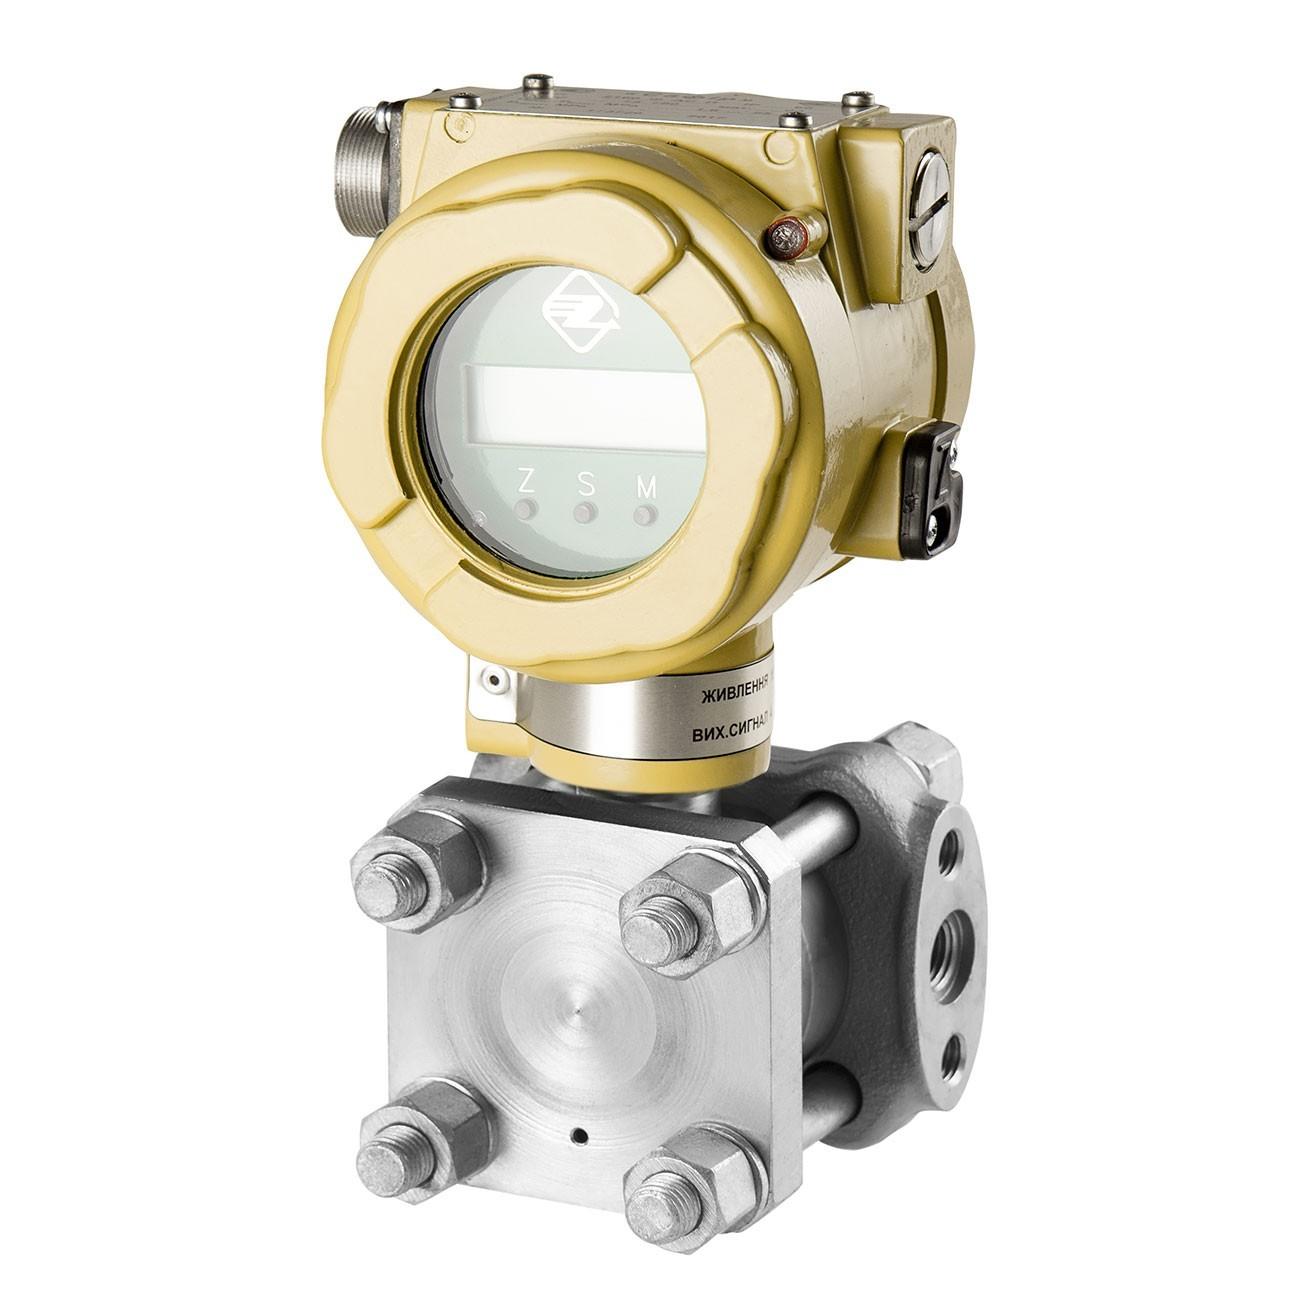 Digital Gauge Pressure Transmitters Safir 2110, 2210, 2310 F